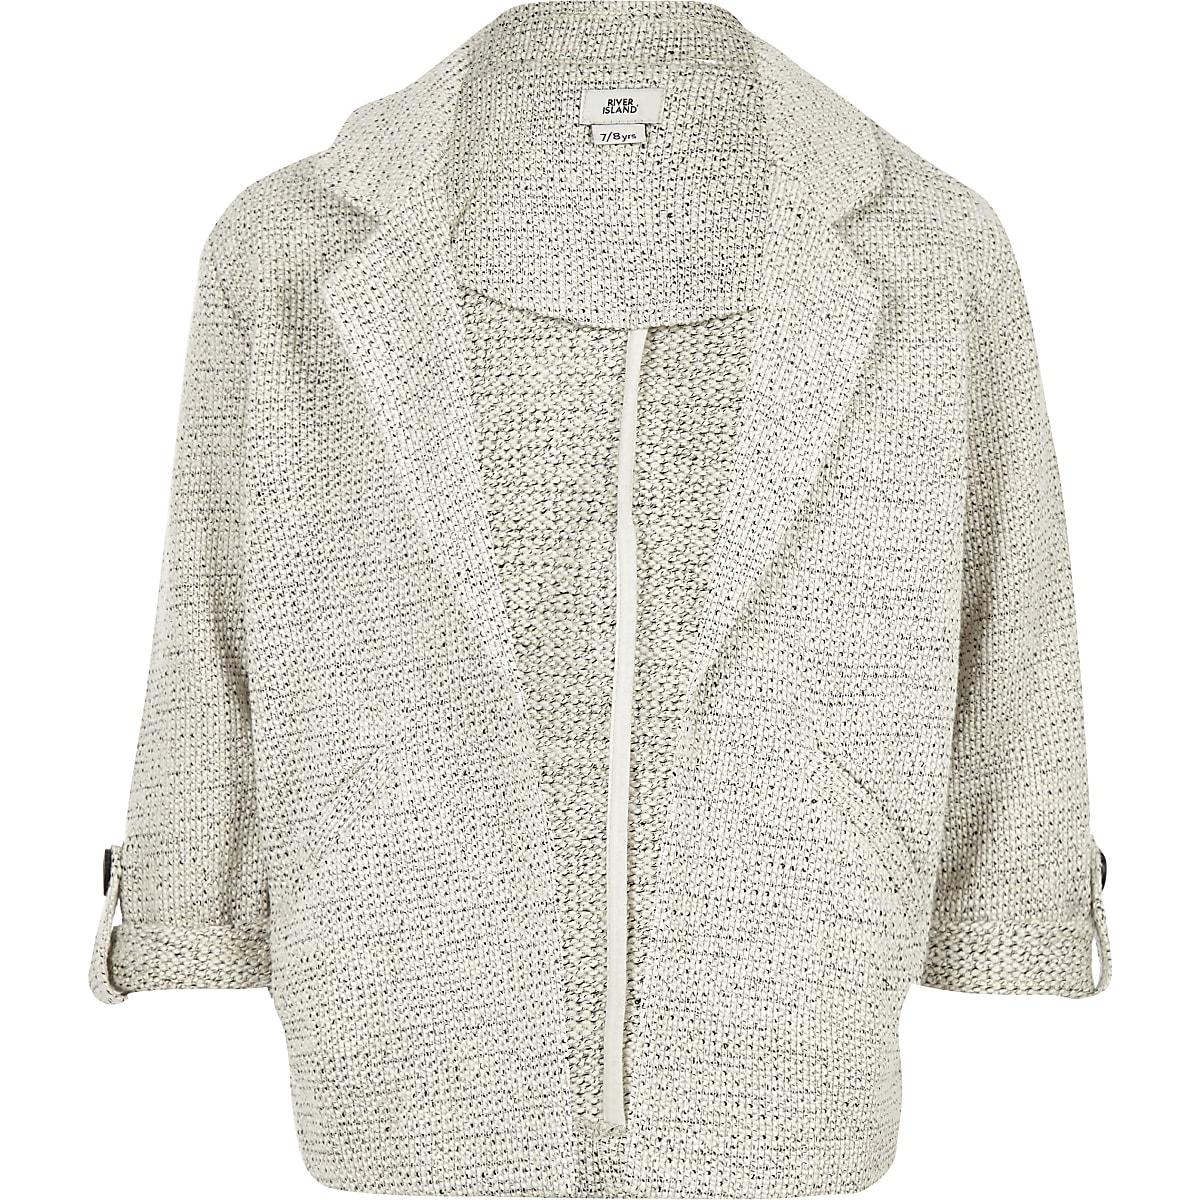 Girls grey jersey jacket